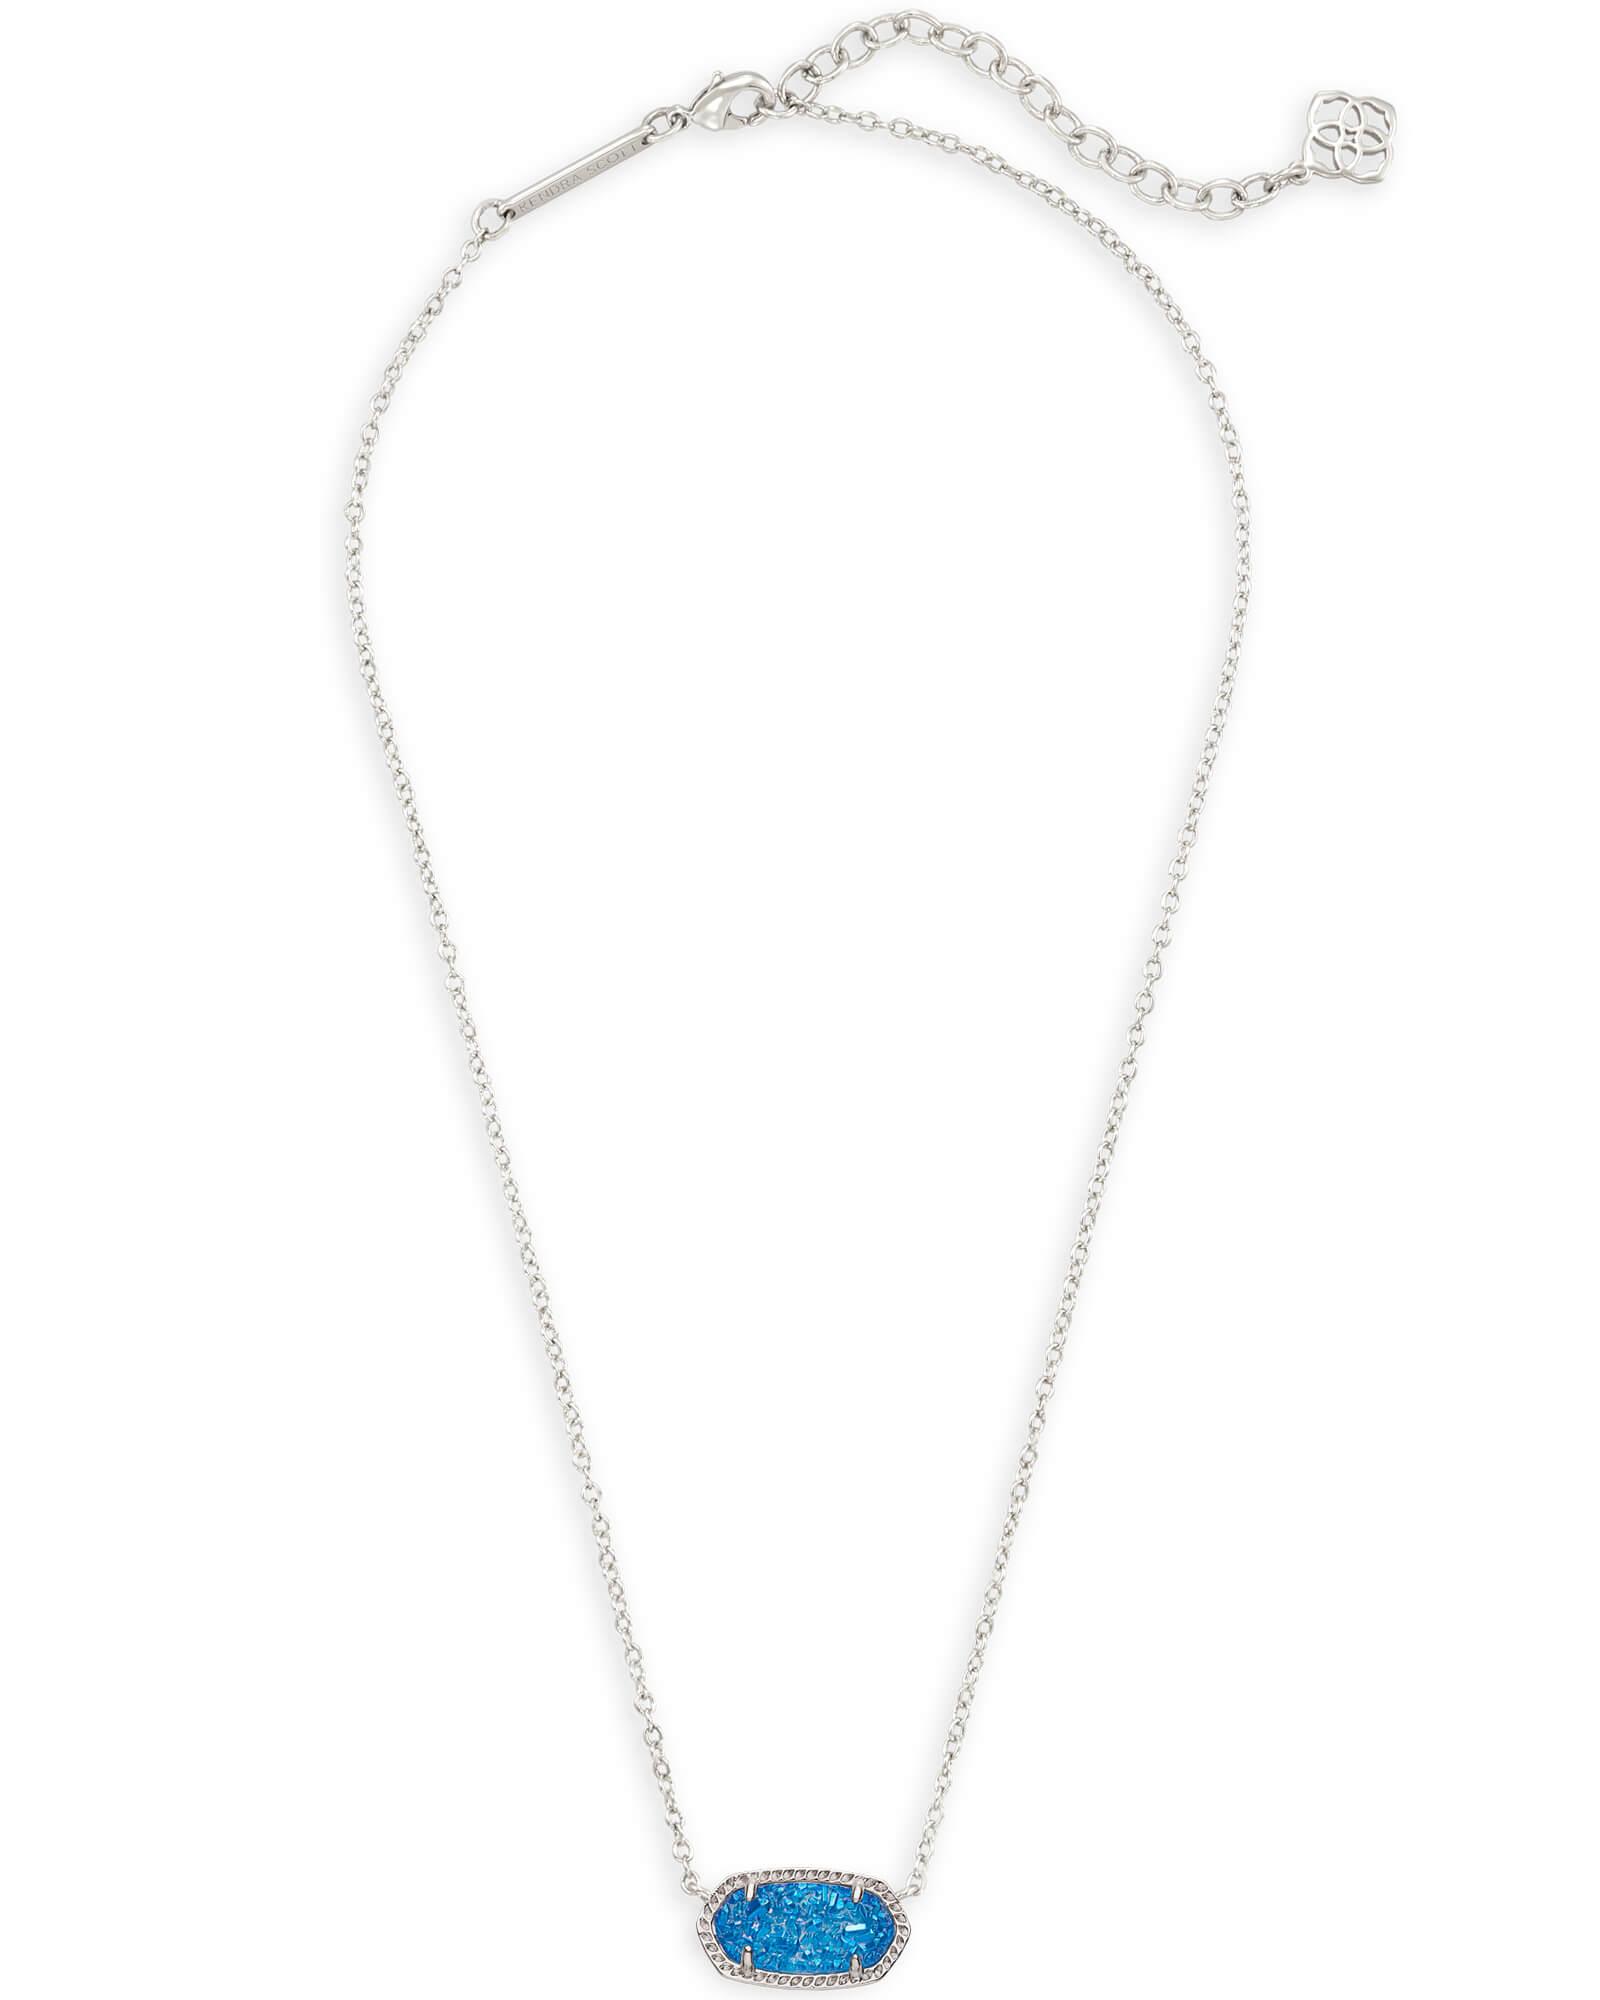 Monies iridescent multi pendant necklace - Black kZVLalxD